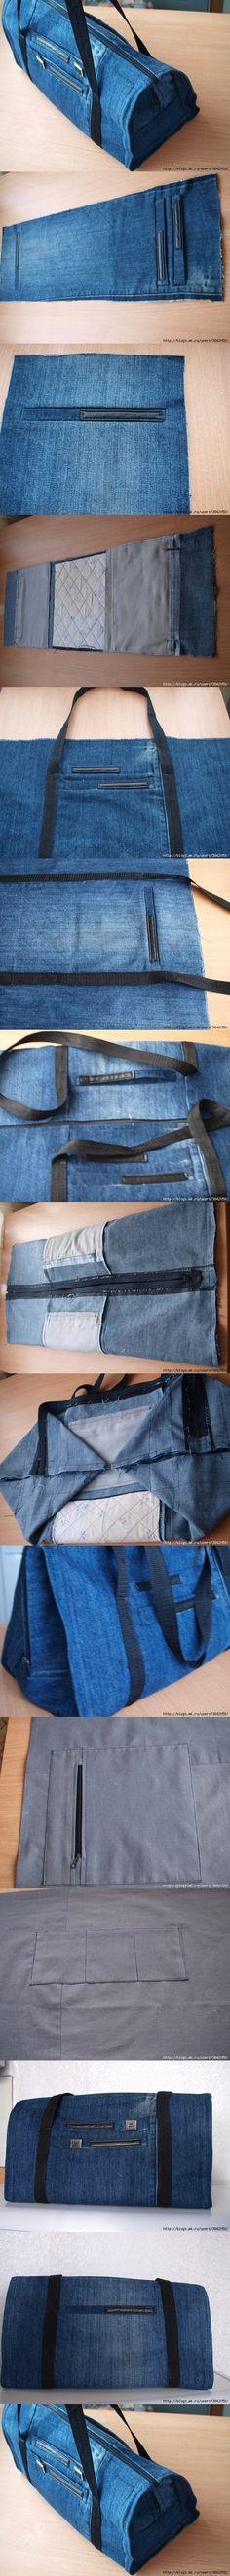 DIY Cool Handbag from Old Jeans | www.FabArtDIY.com